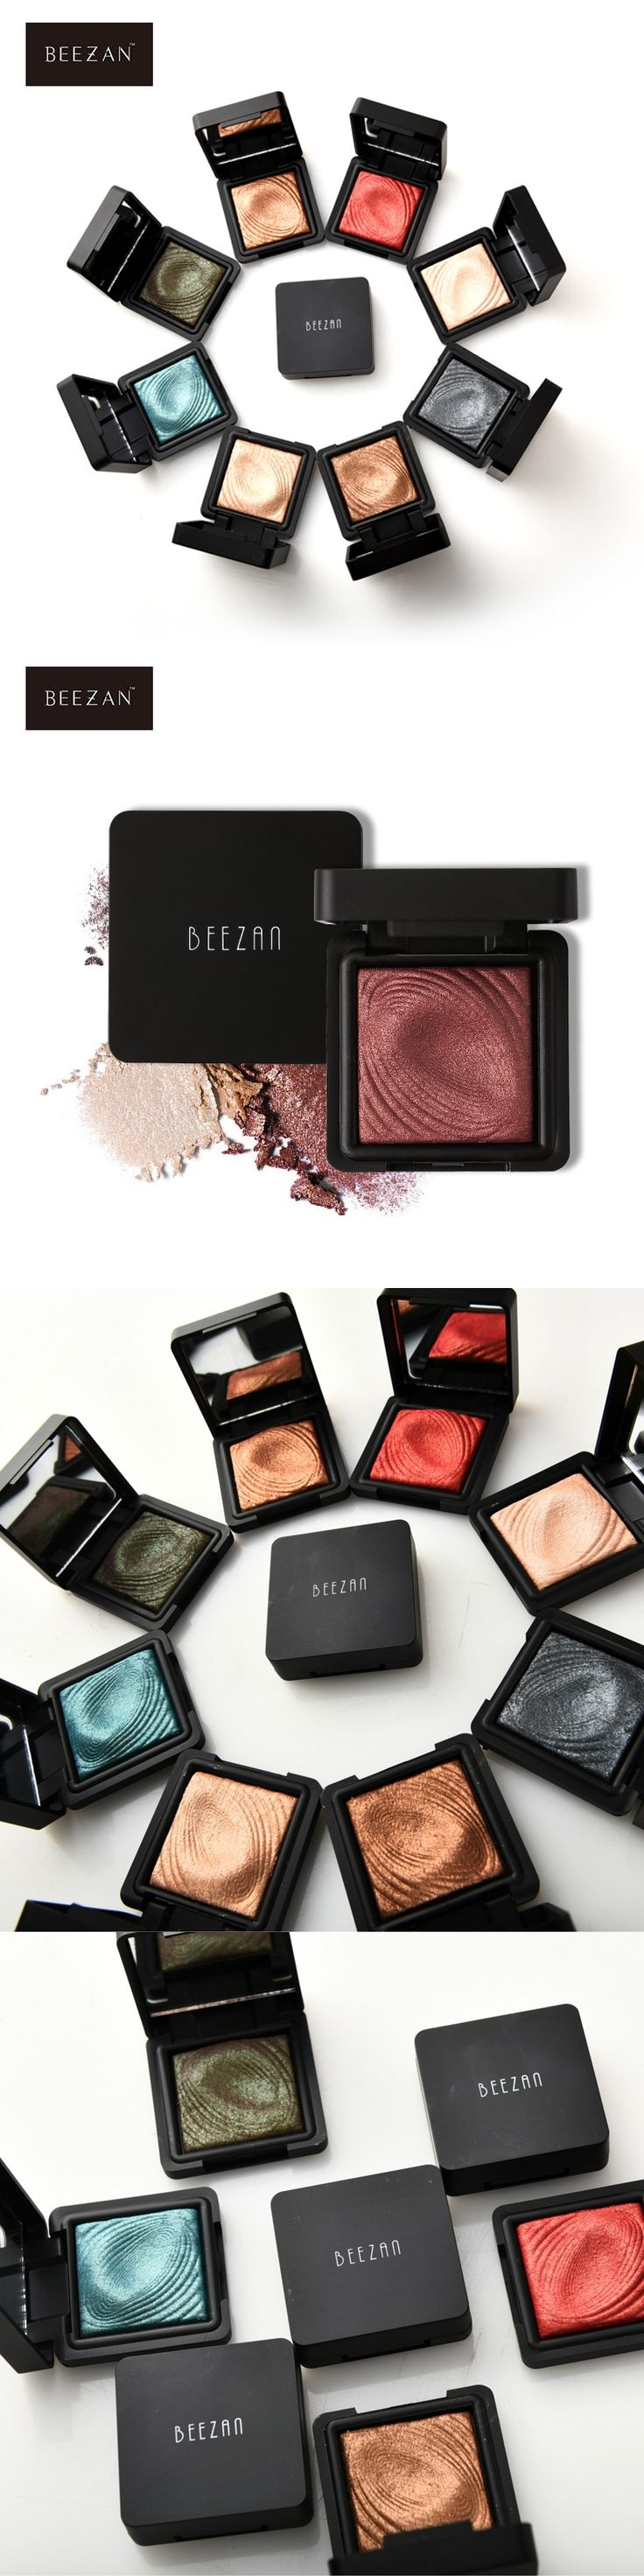 BEEZAN 8 Colors Metallic Glitter Bright Single Eyeshadow Palette Excellent Powder Makeup Pigment Shimmer Waterproof Eyeshadow